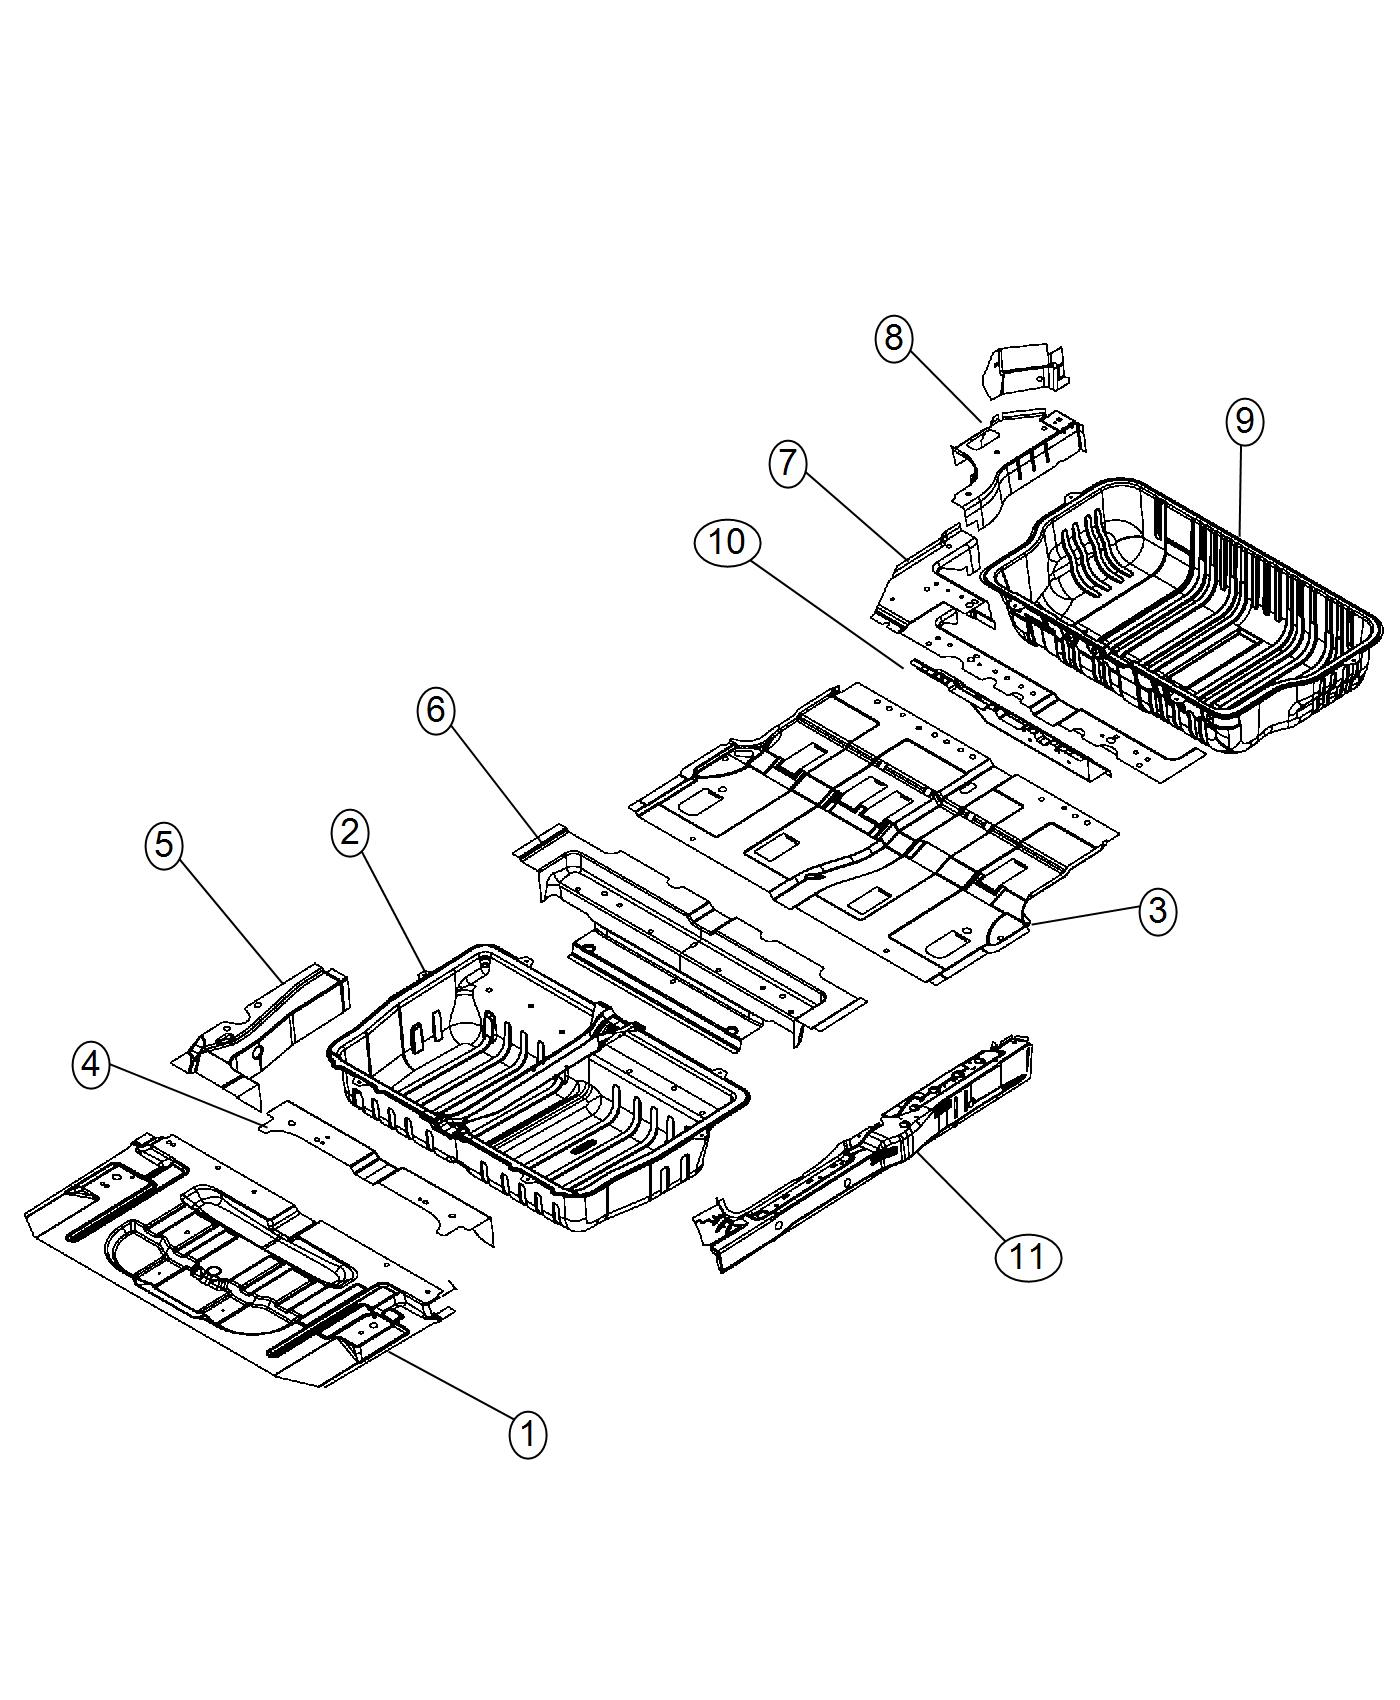 2008 Dodge Grand Caravan Panel Left Sill Inner Body Wiring Diagram